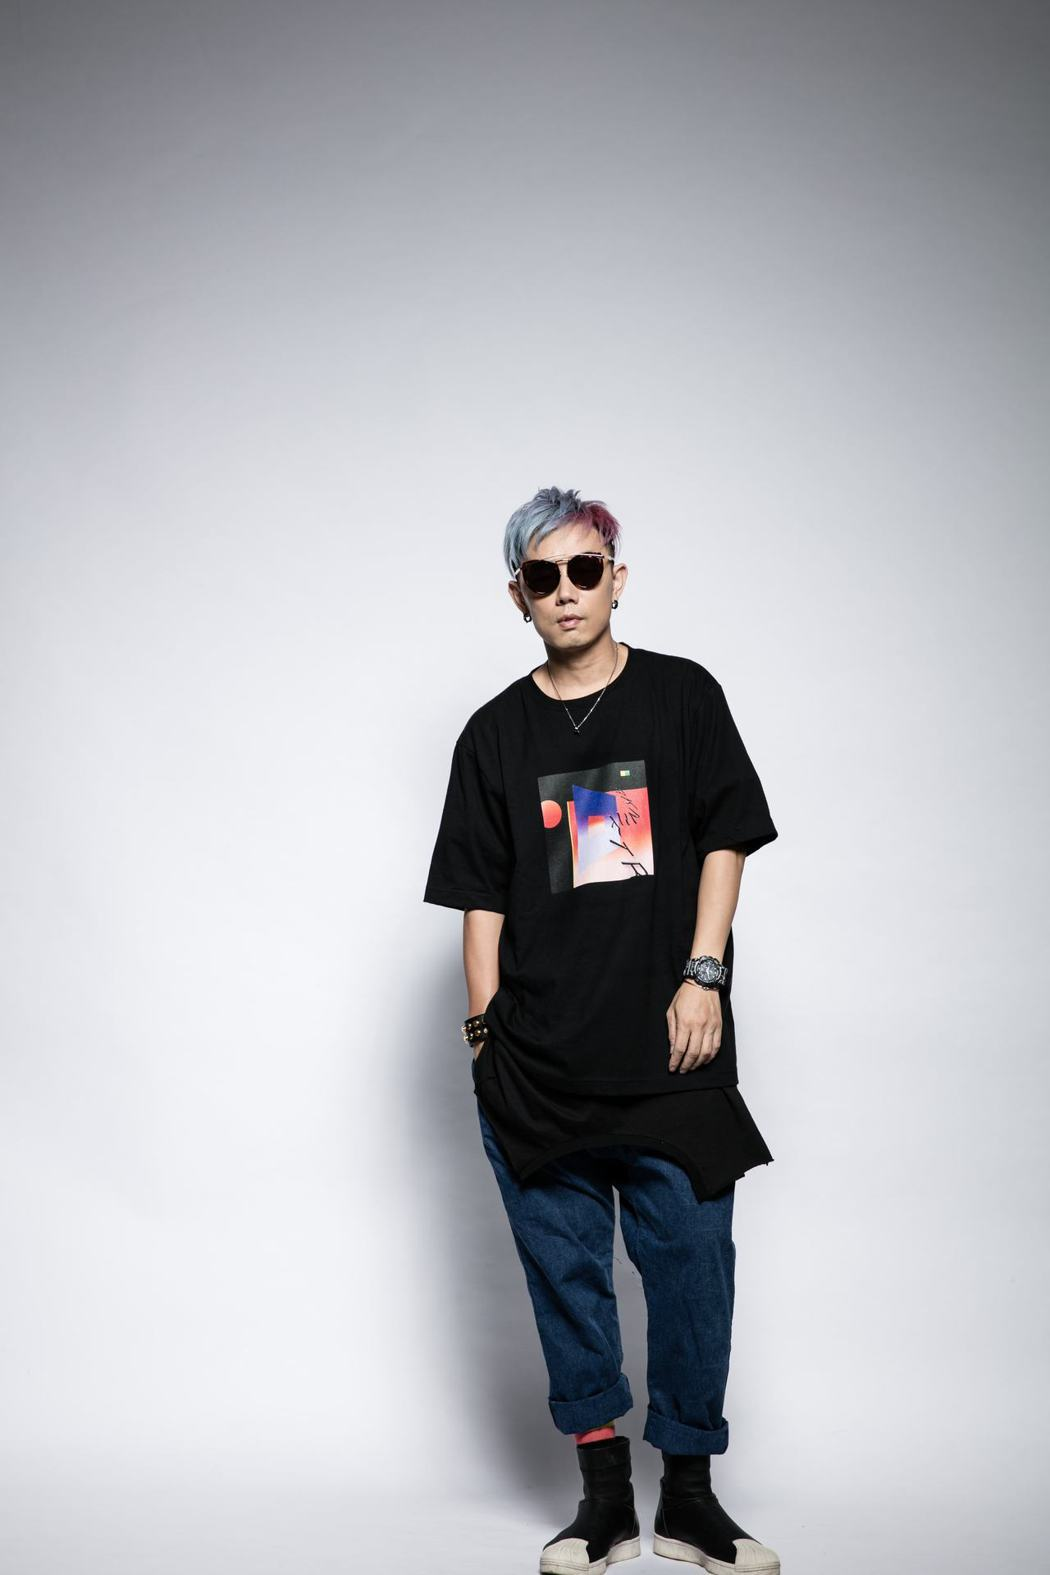 DJ林哲儀找玖壹壹健志合作電音舞曲。圖/滾石電音提供